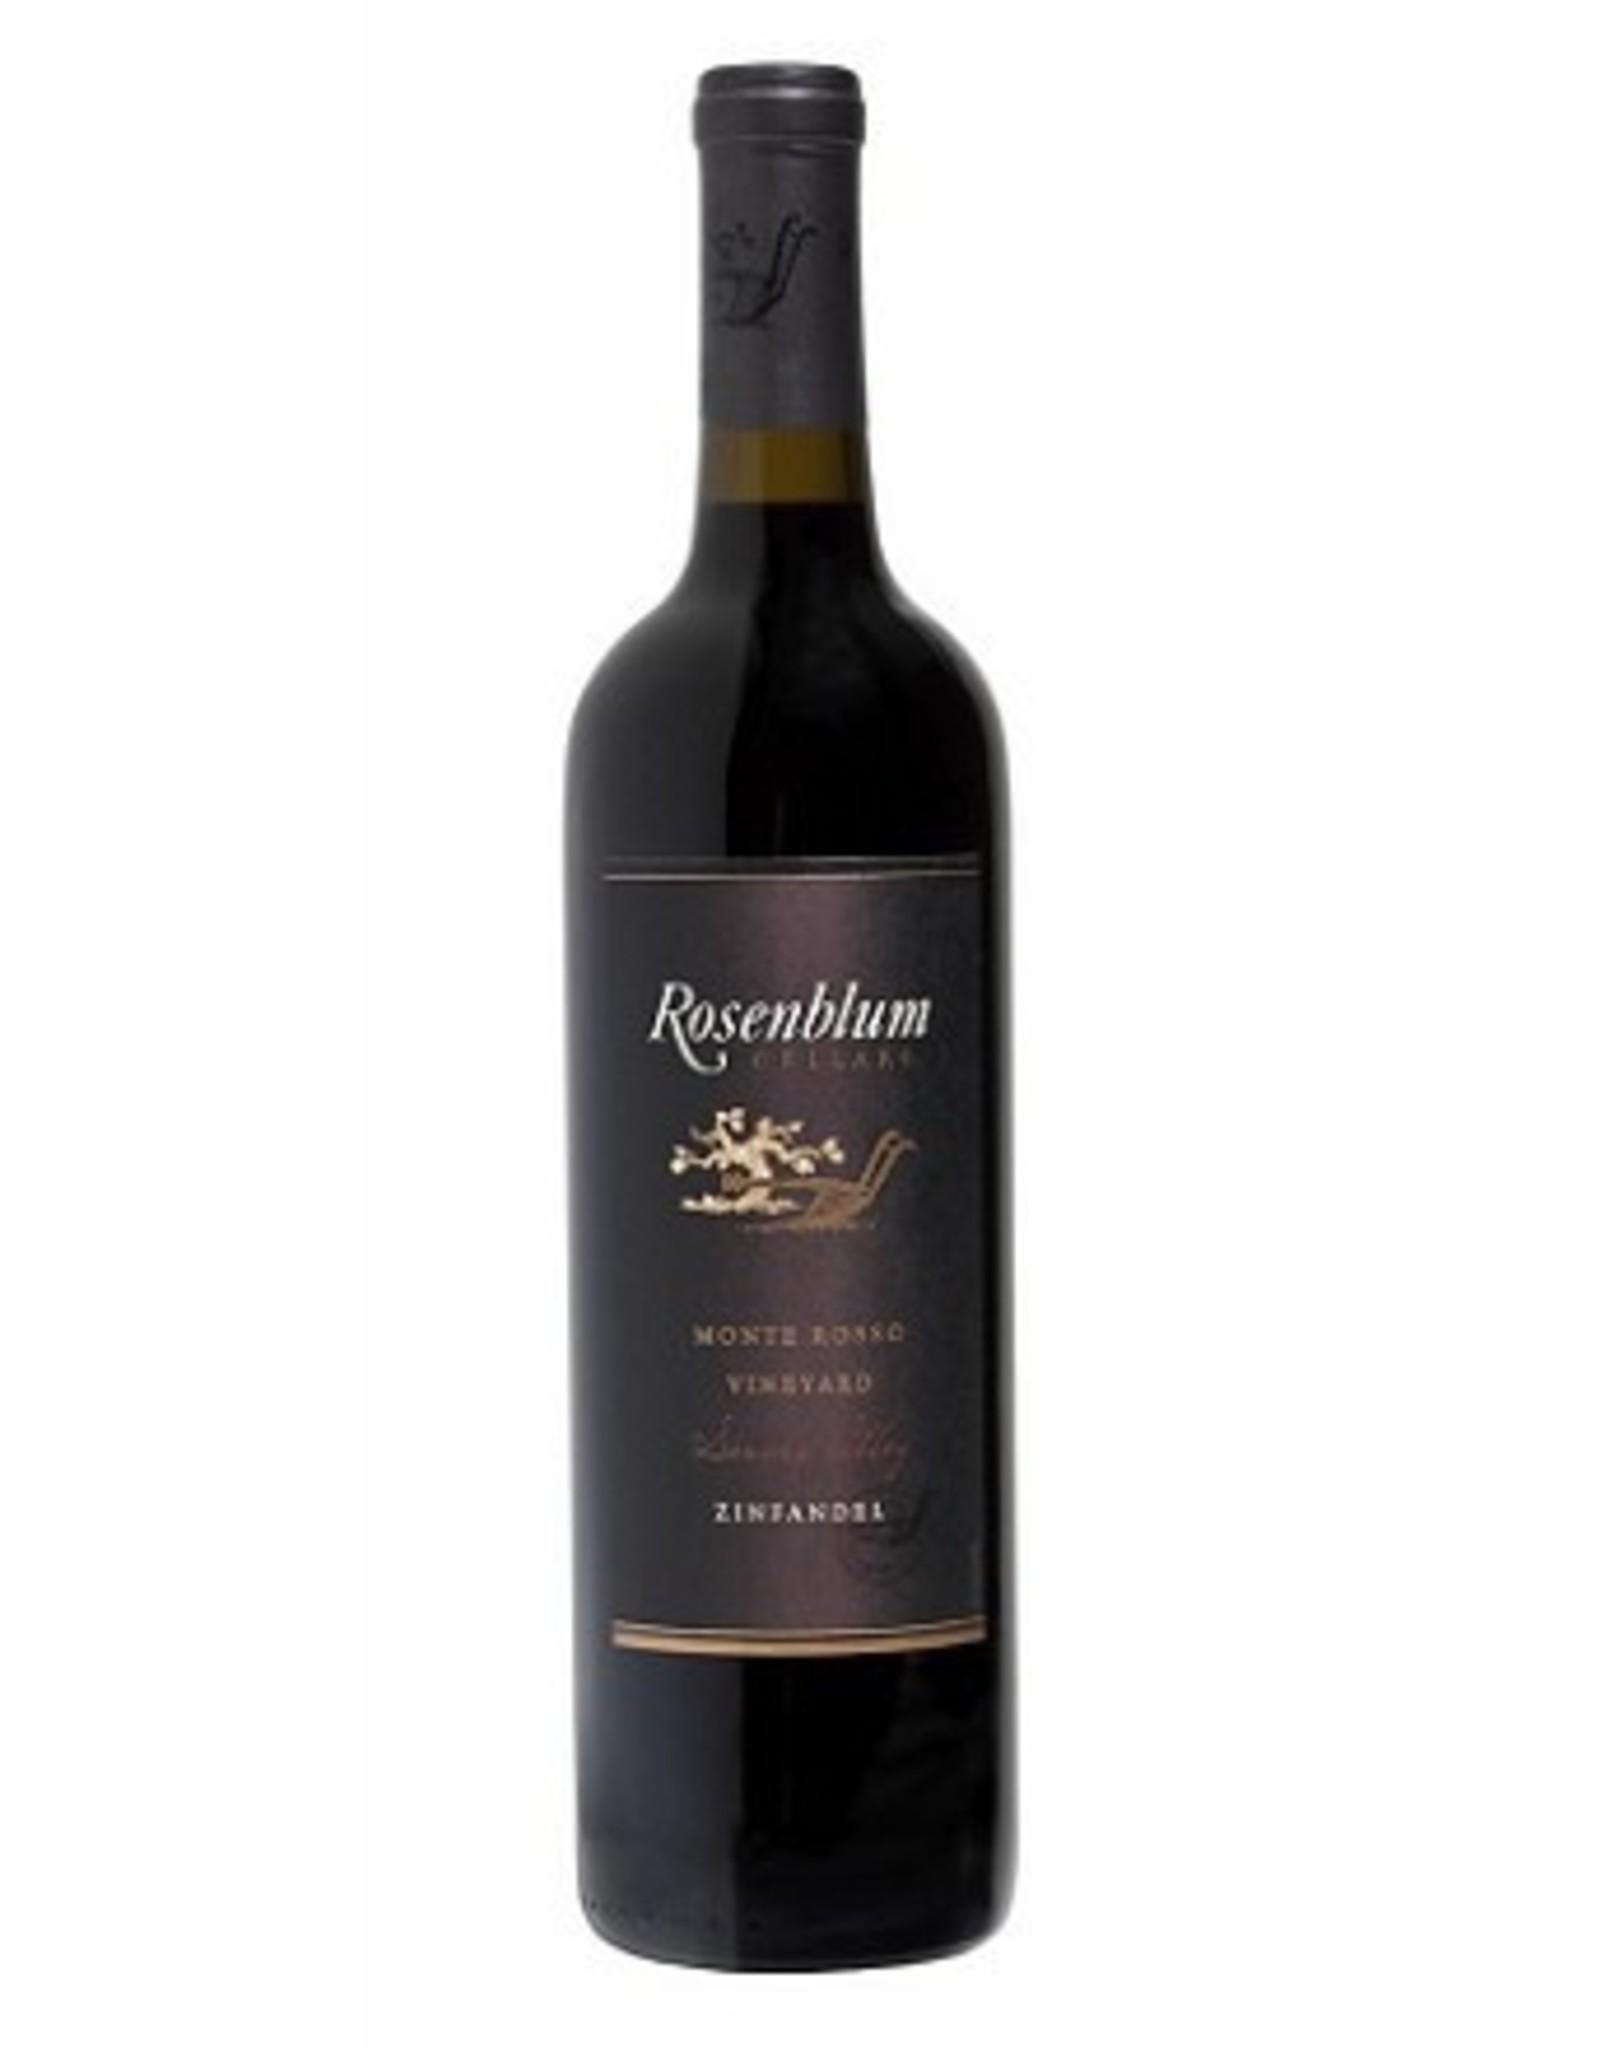 Red Wine 2010, Rosenblum Cellars Zinfandel Reserve Monte Rosso Vineyard, Zinfandel, Dry Creek Valley, Sonoma County, California, 15.9% Alc,